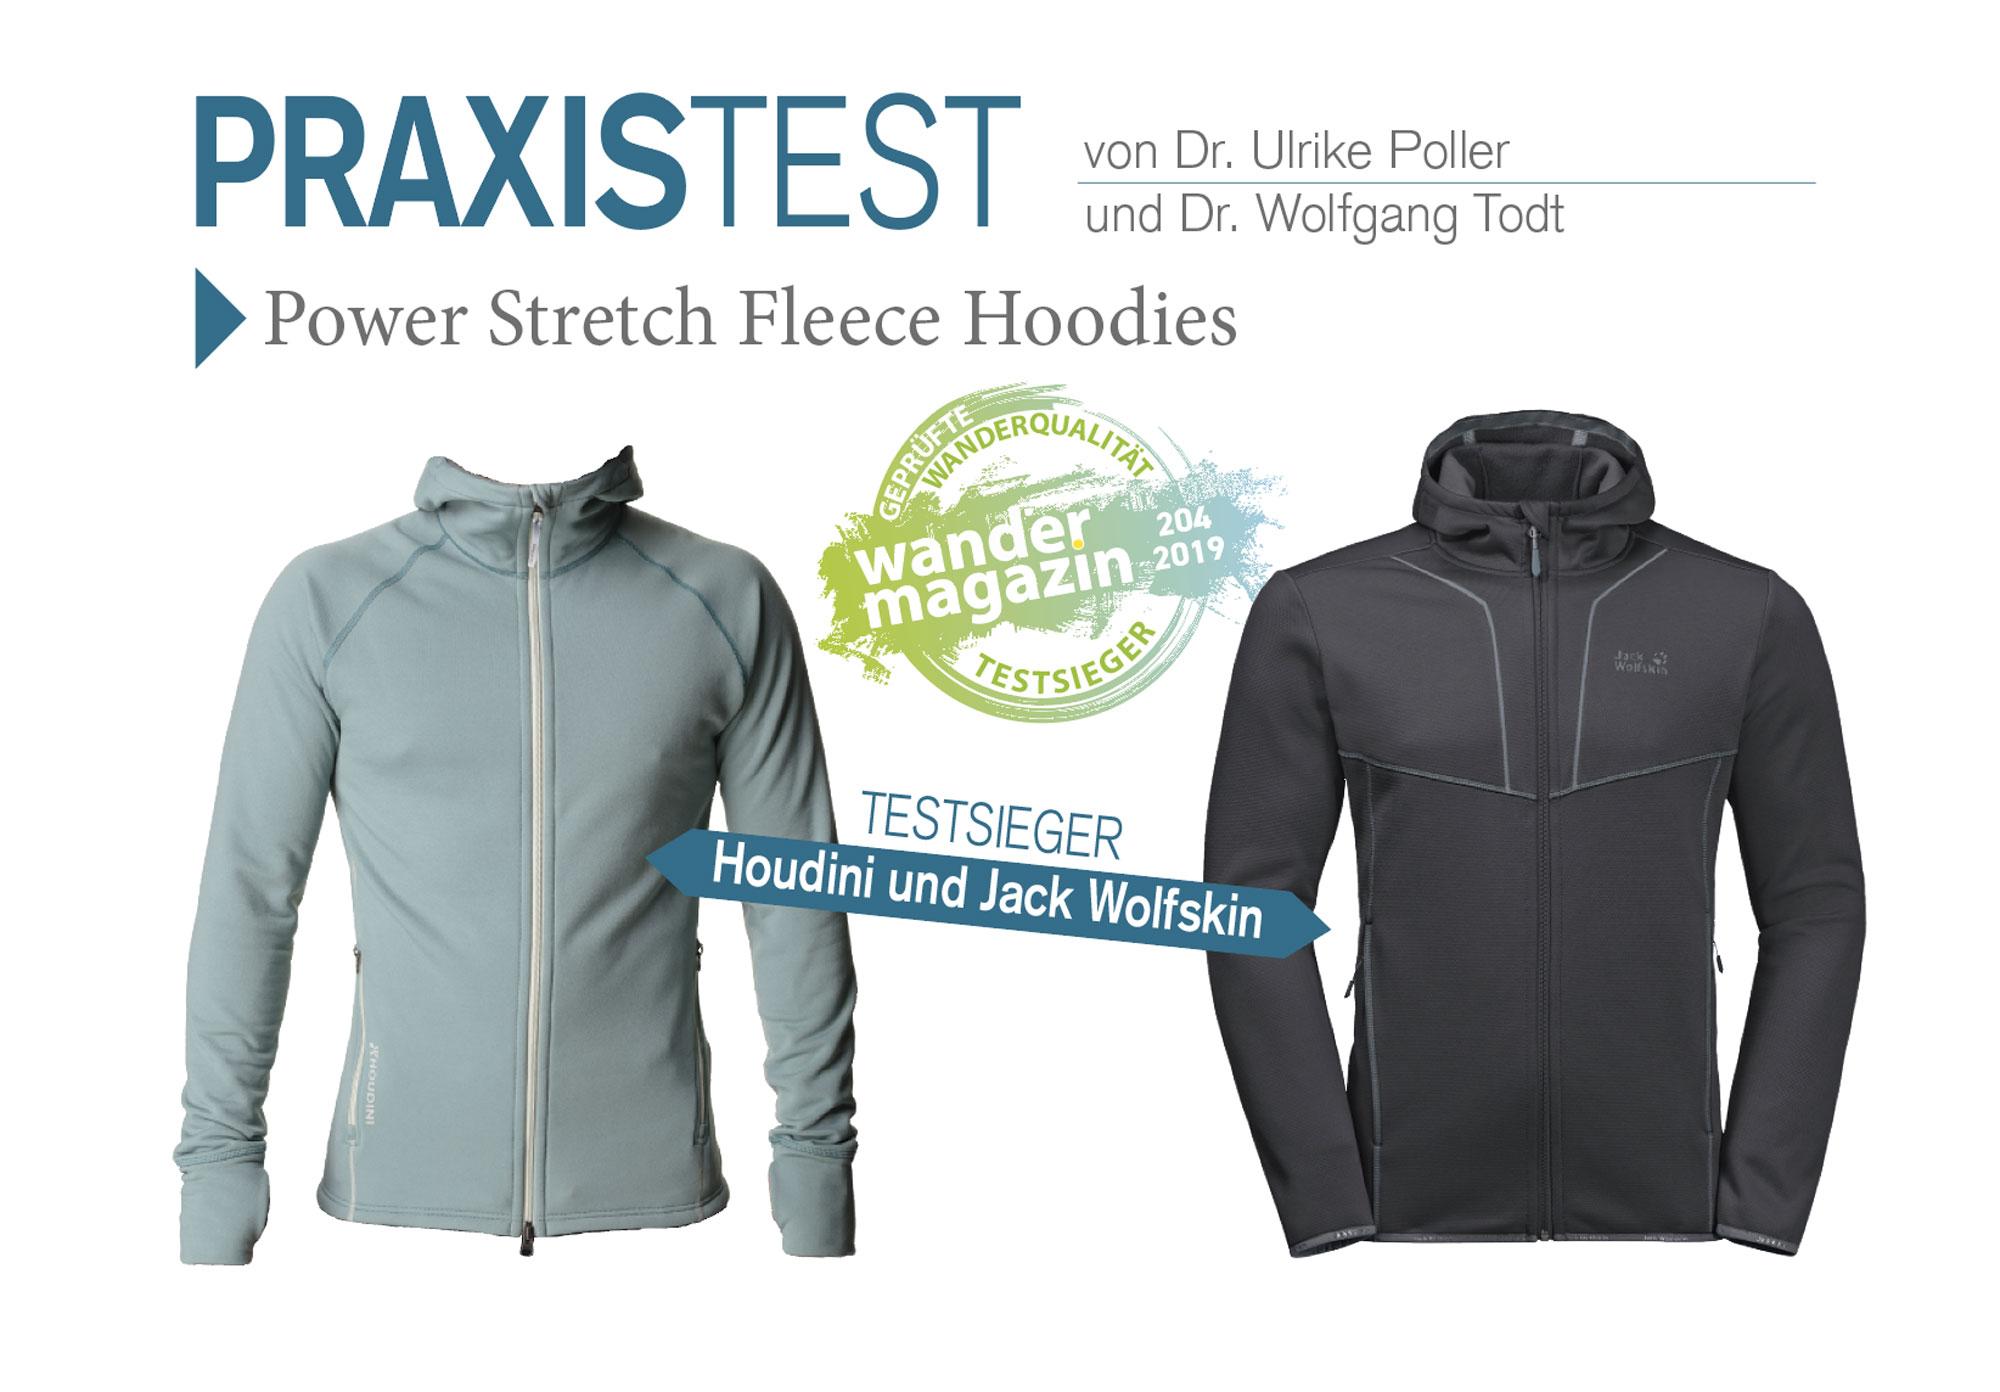 Jack Wolfskin Pullover Jacke in 9766 Park Hosingen for